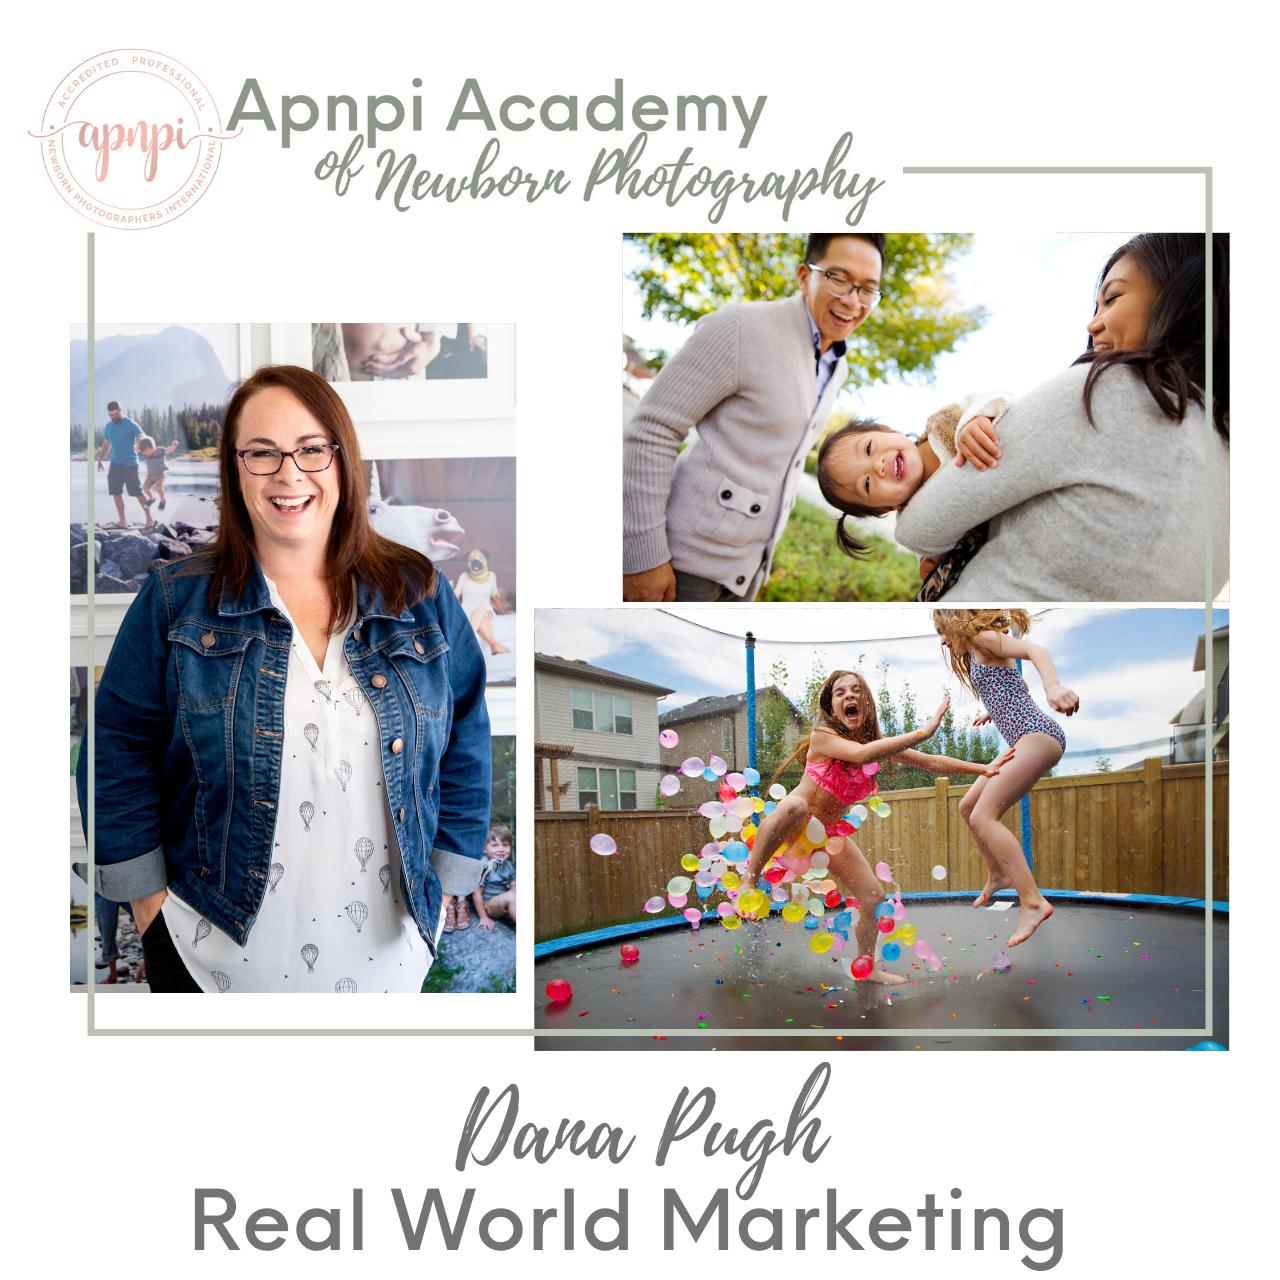 Dana Pugh Newborn Photography Marketing APNPI Academy Course